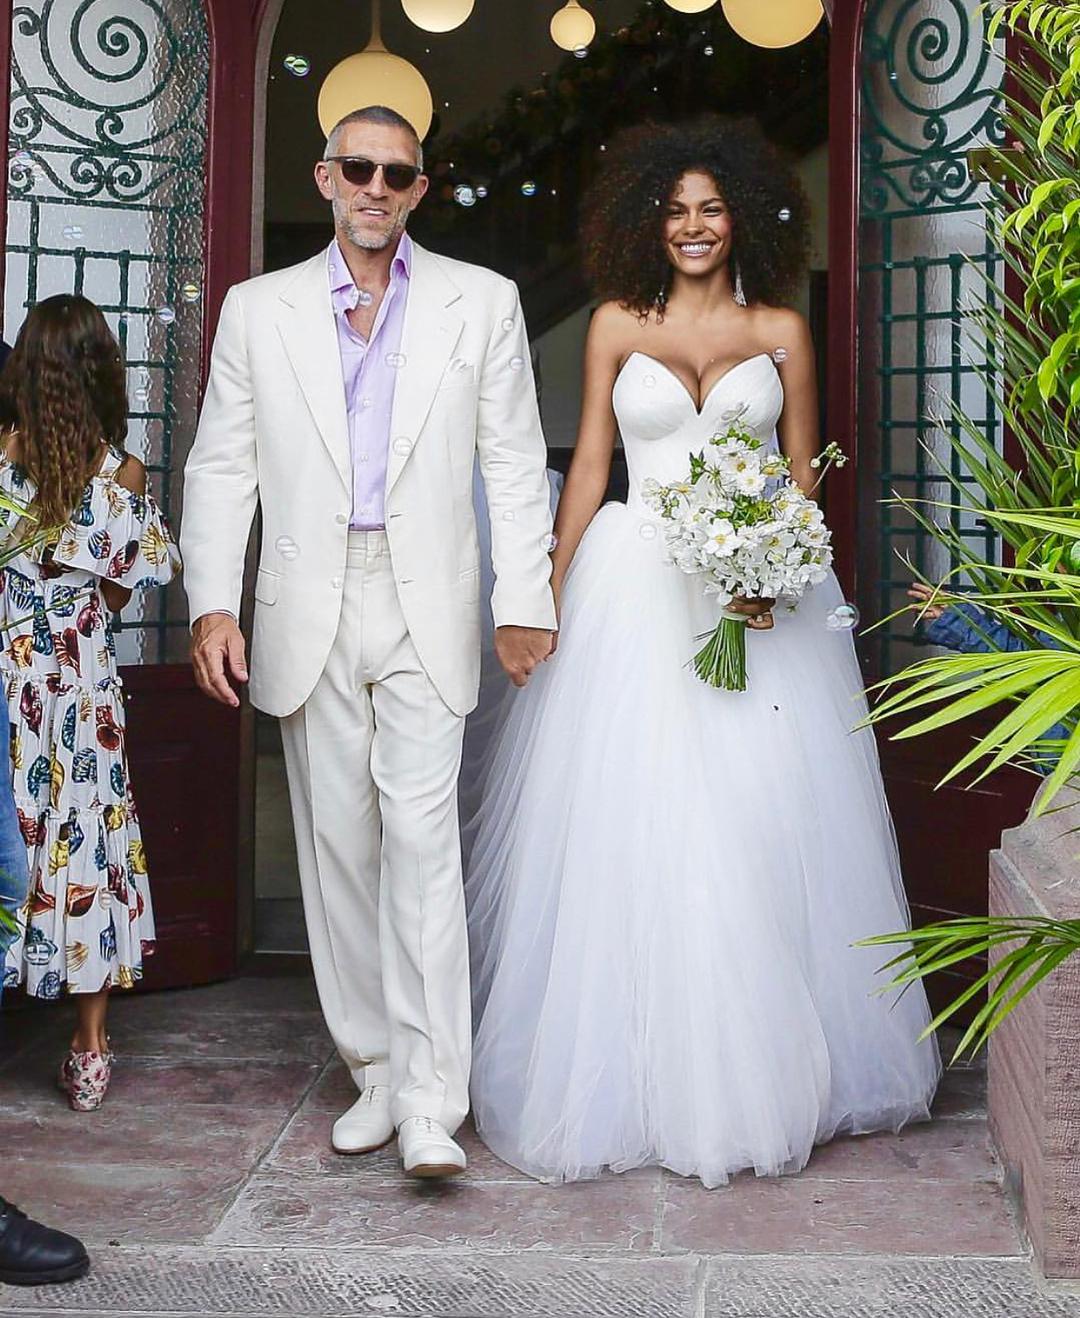 Di I Il Matrimonio E Vincent Dettagli CasselTutti Tina Kunakey kXTZiPuO